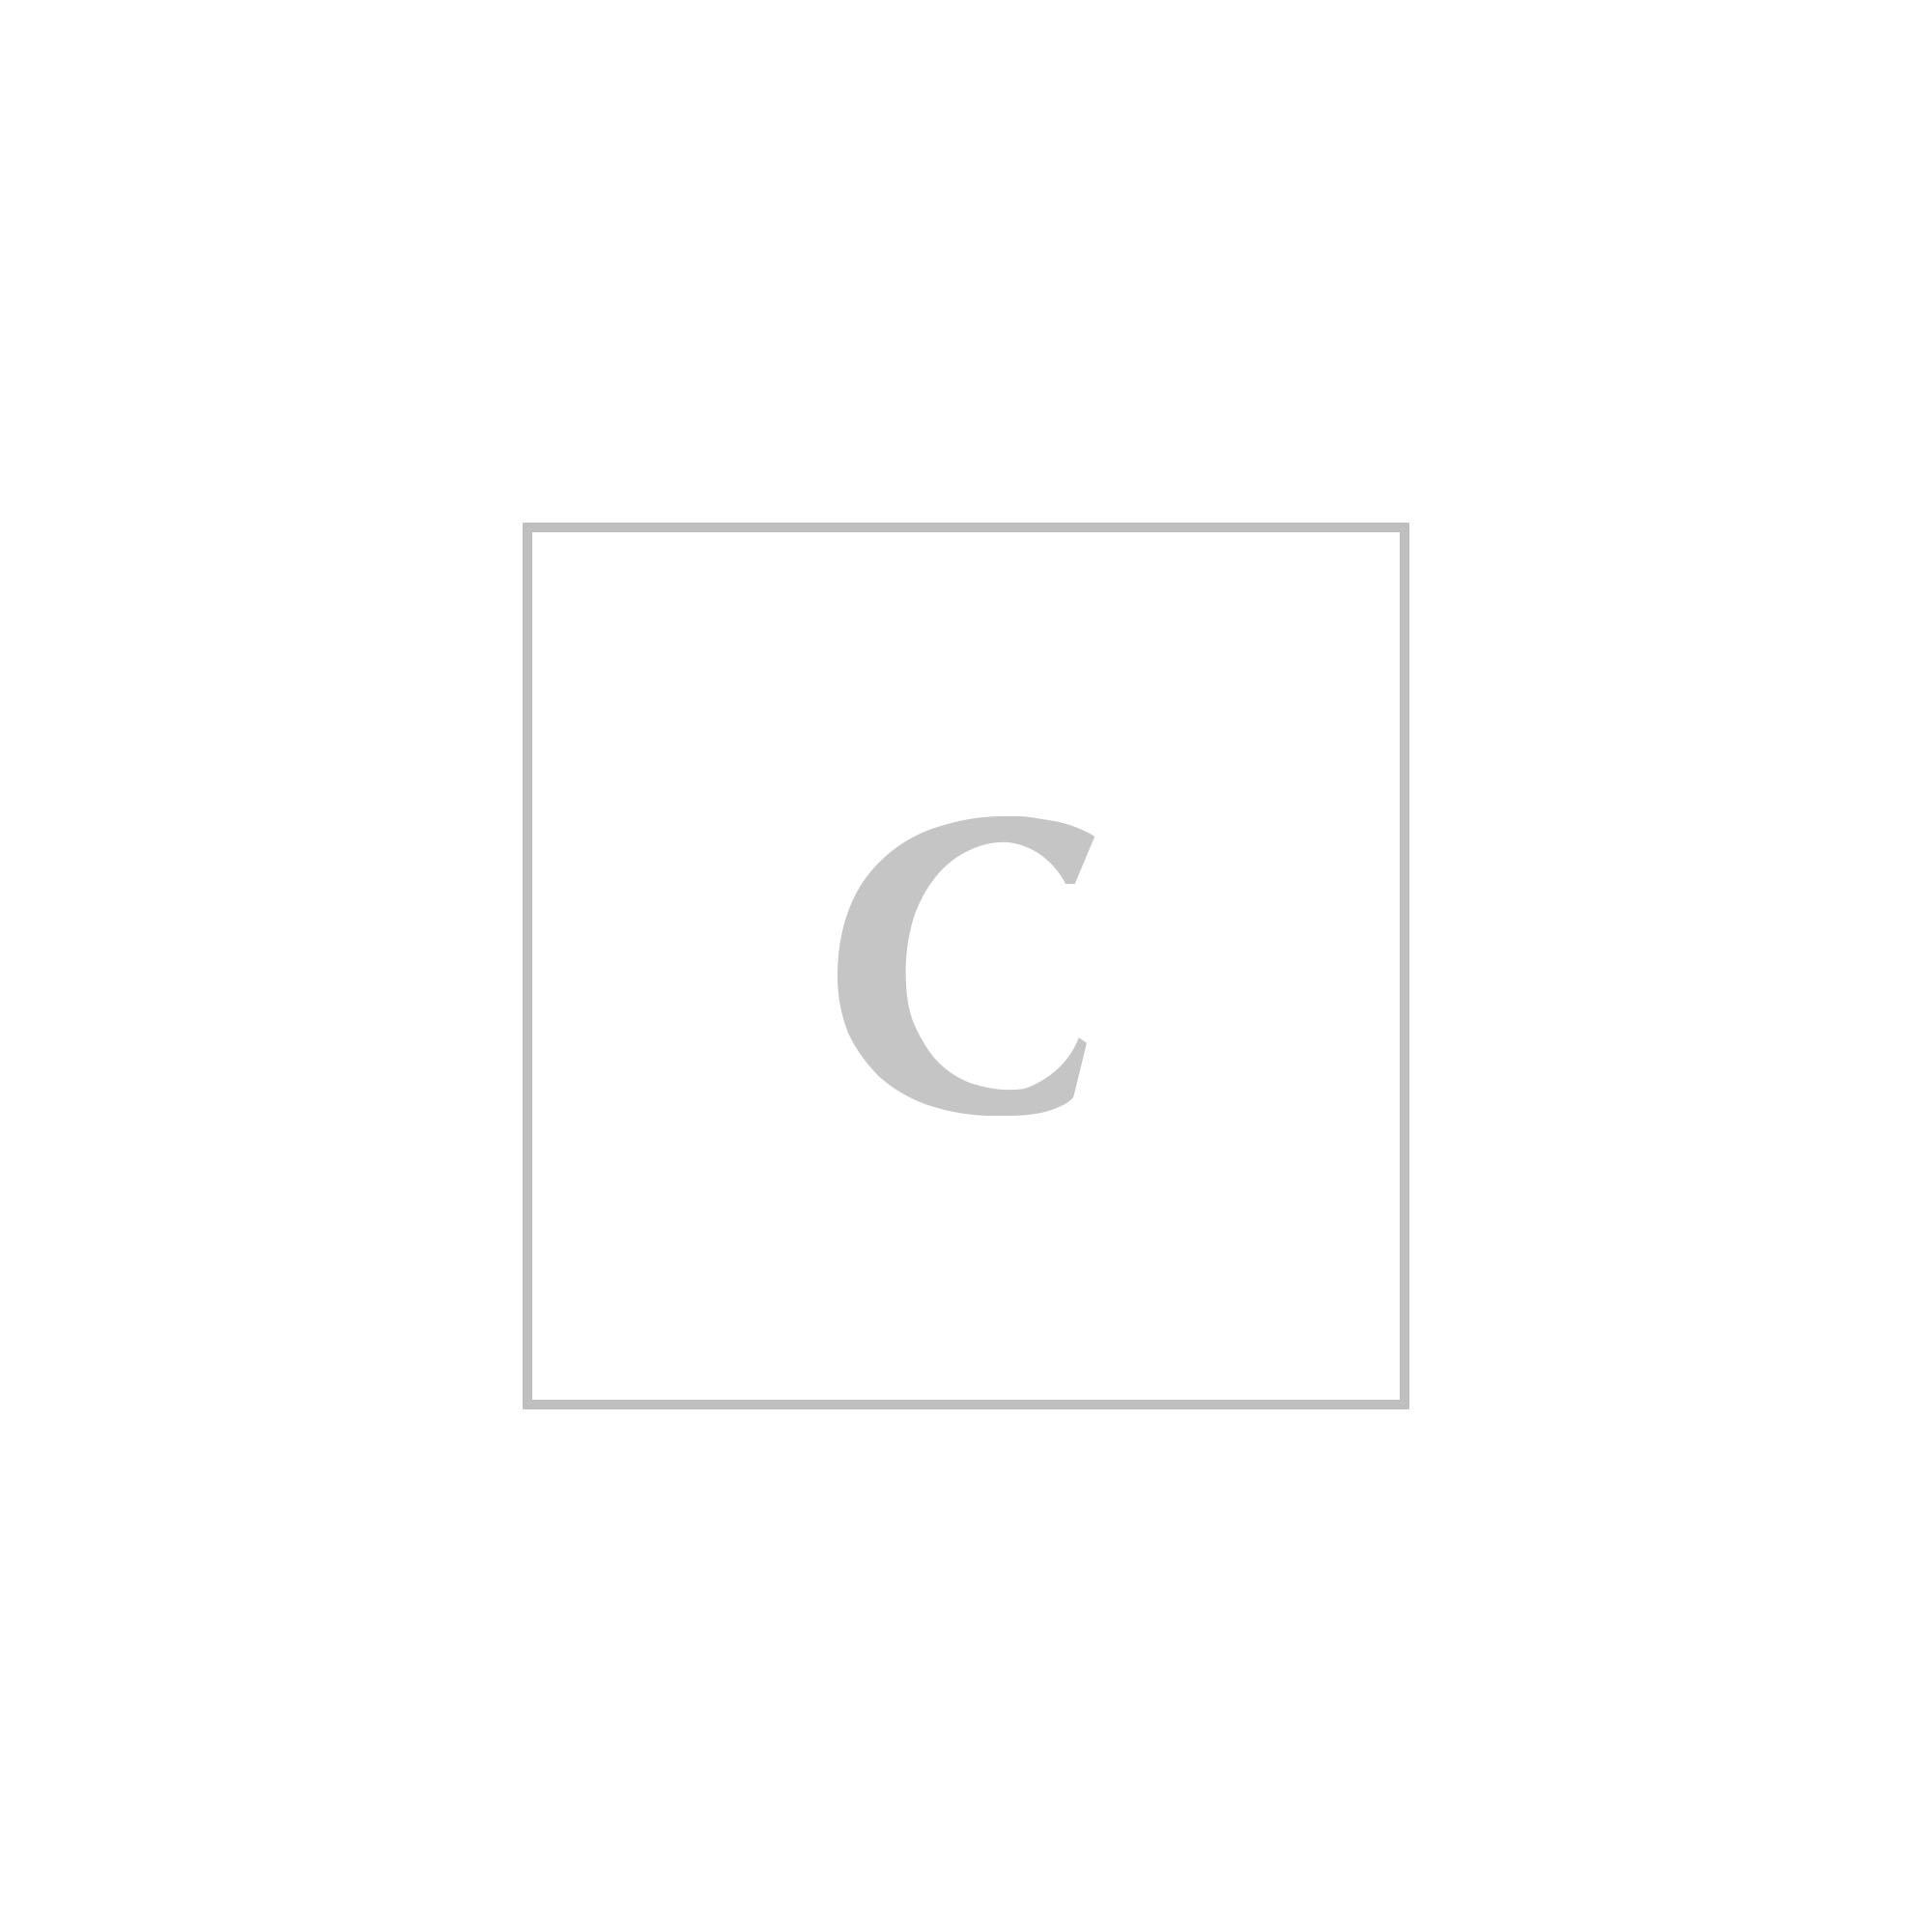 Saint laurent monogram jolie case